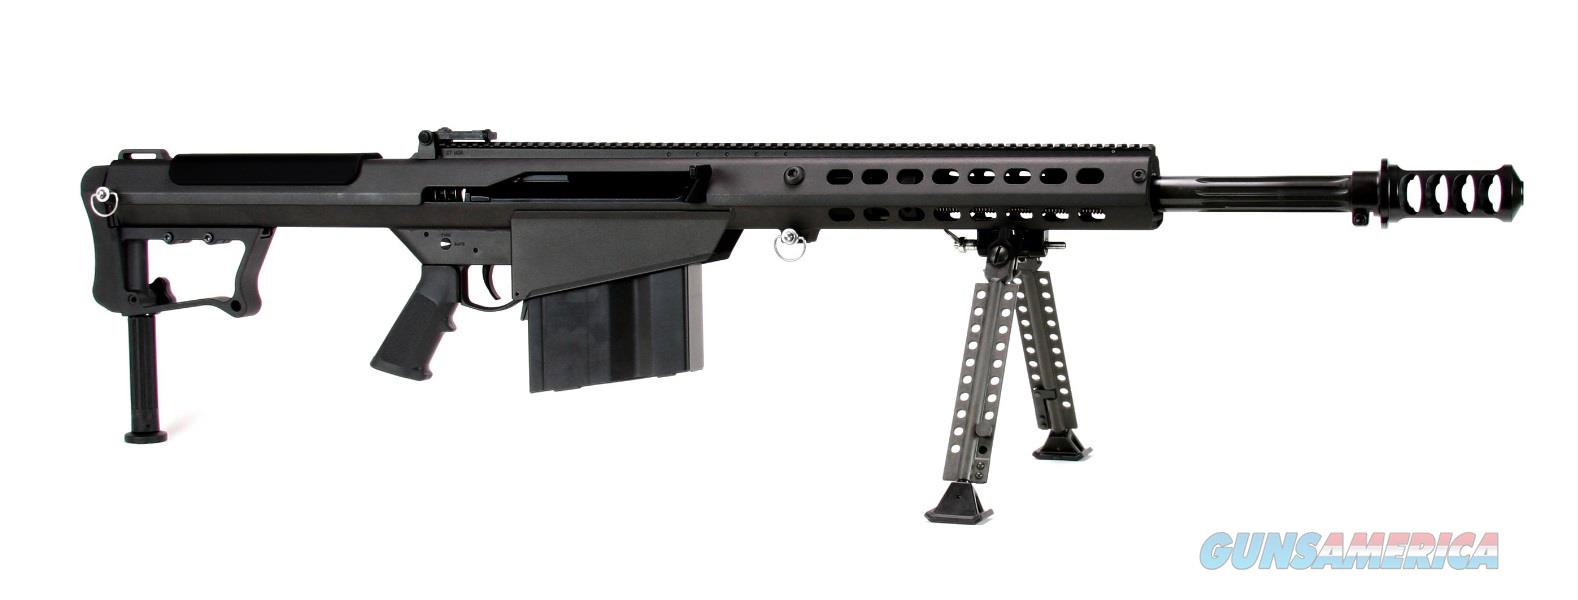 "M107a1 50Bmg Blk 20"" 10+1 14084  Guns > Rifles > Barrett Rifles"